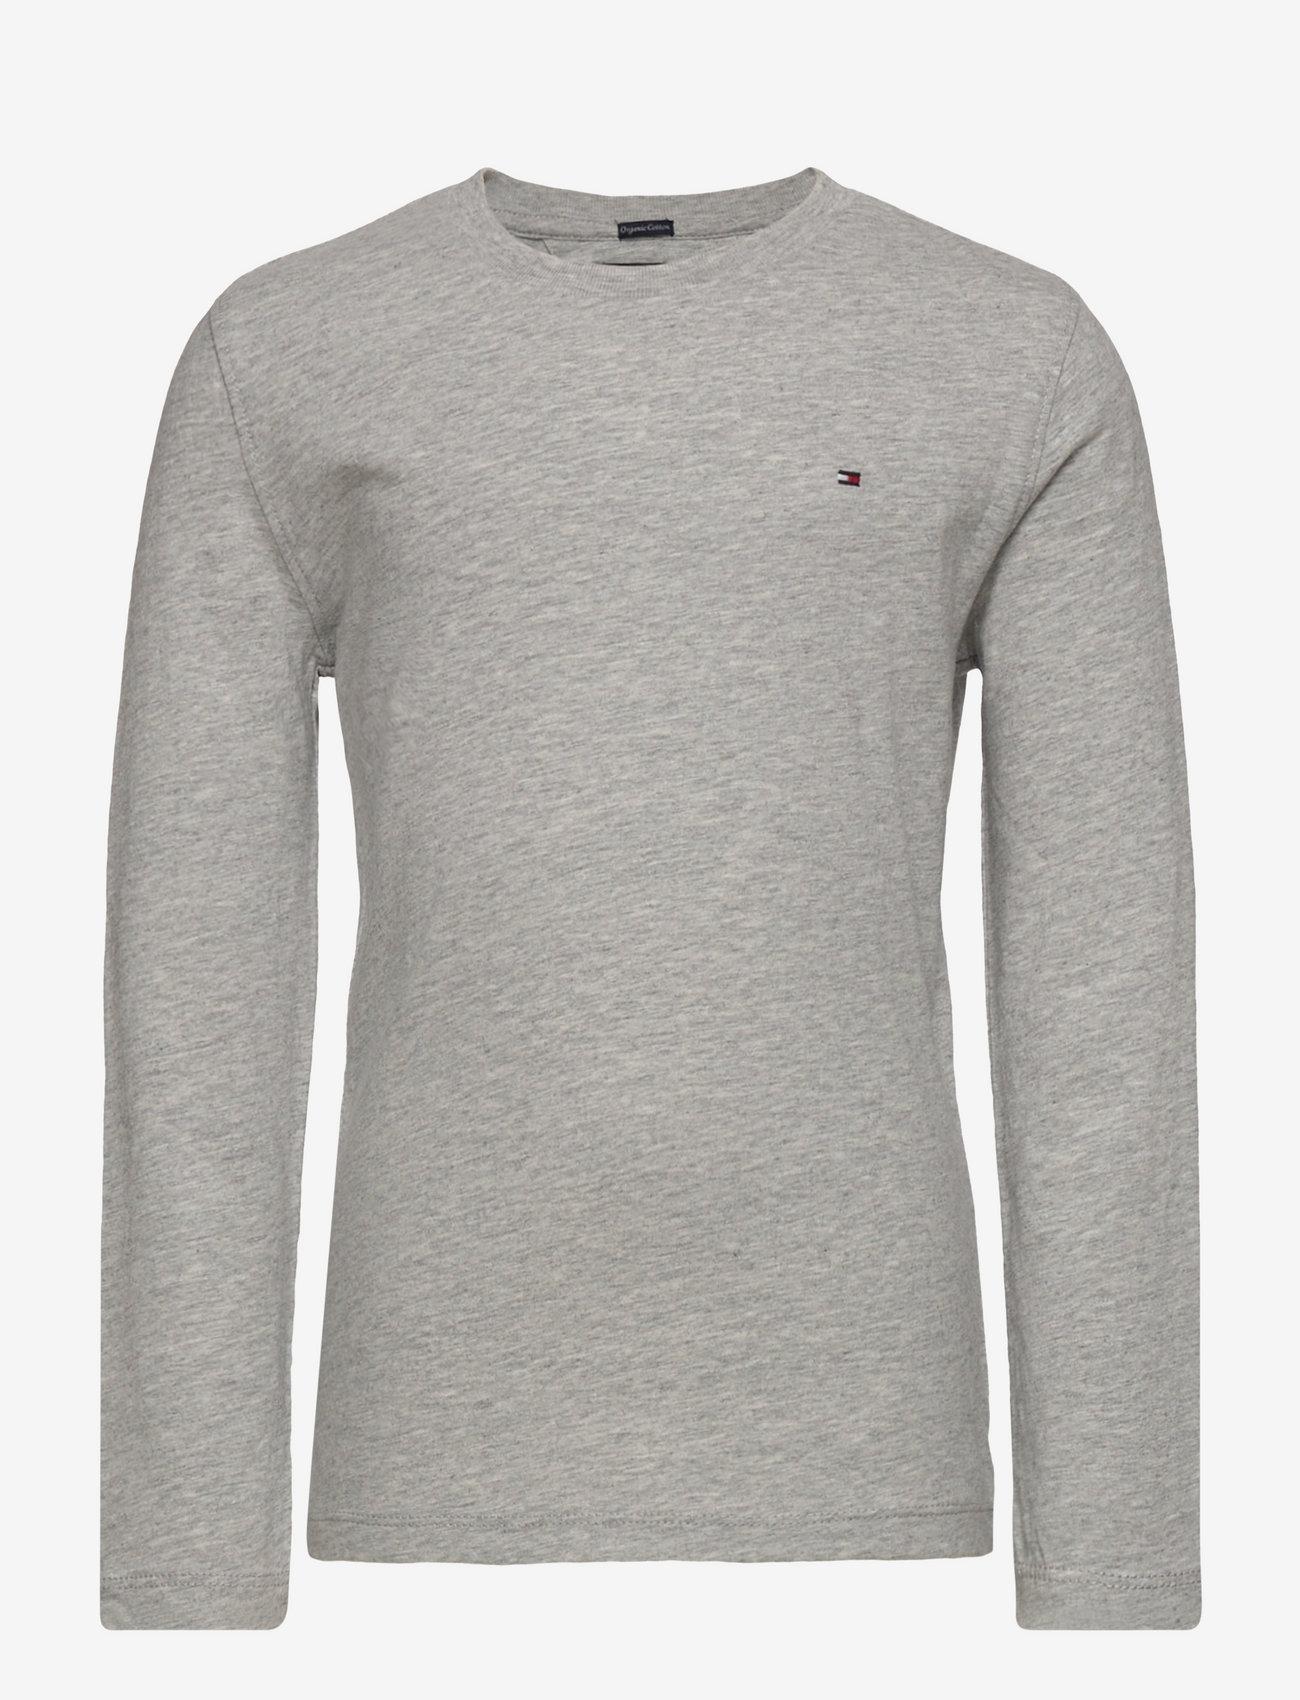 Tommy Hilfiger - BOYS BASIC CN KNIT L - long-sleeved t-shirts - grey heather - 0